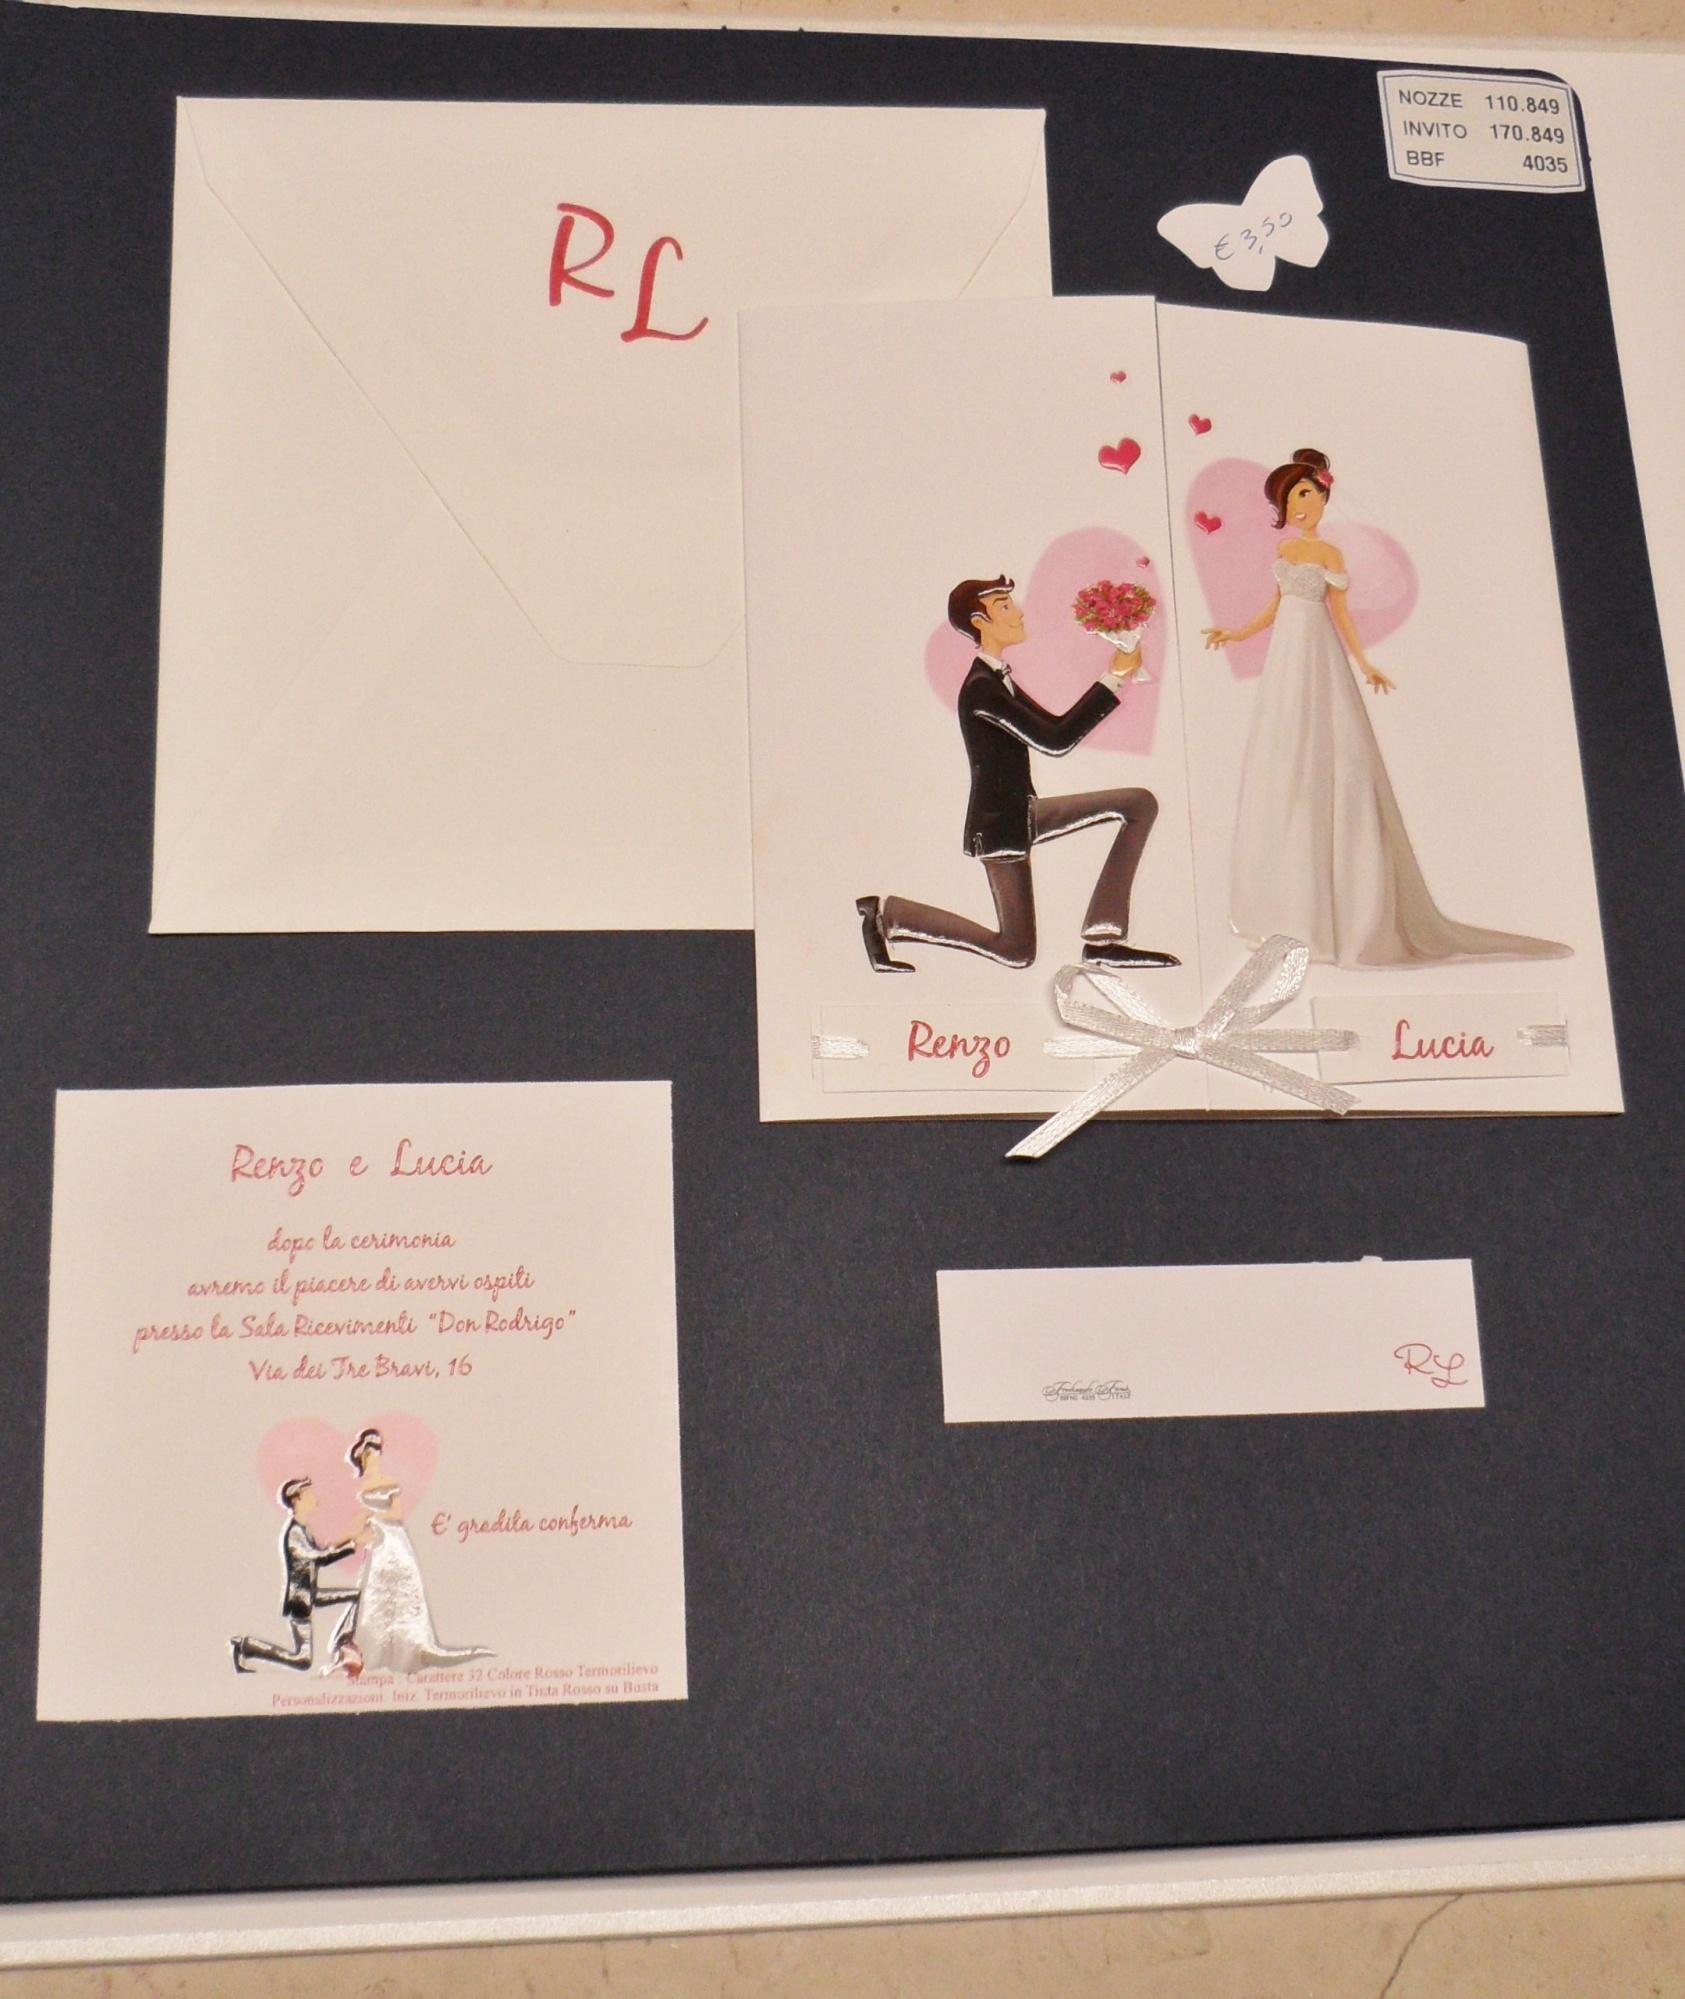 Partecipazioni Originali Per Matrimonio.Partecipazioni Nozze Lux 2018 Originali Eleganti Spiritose